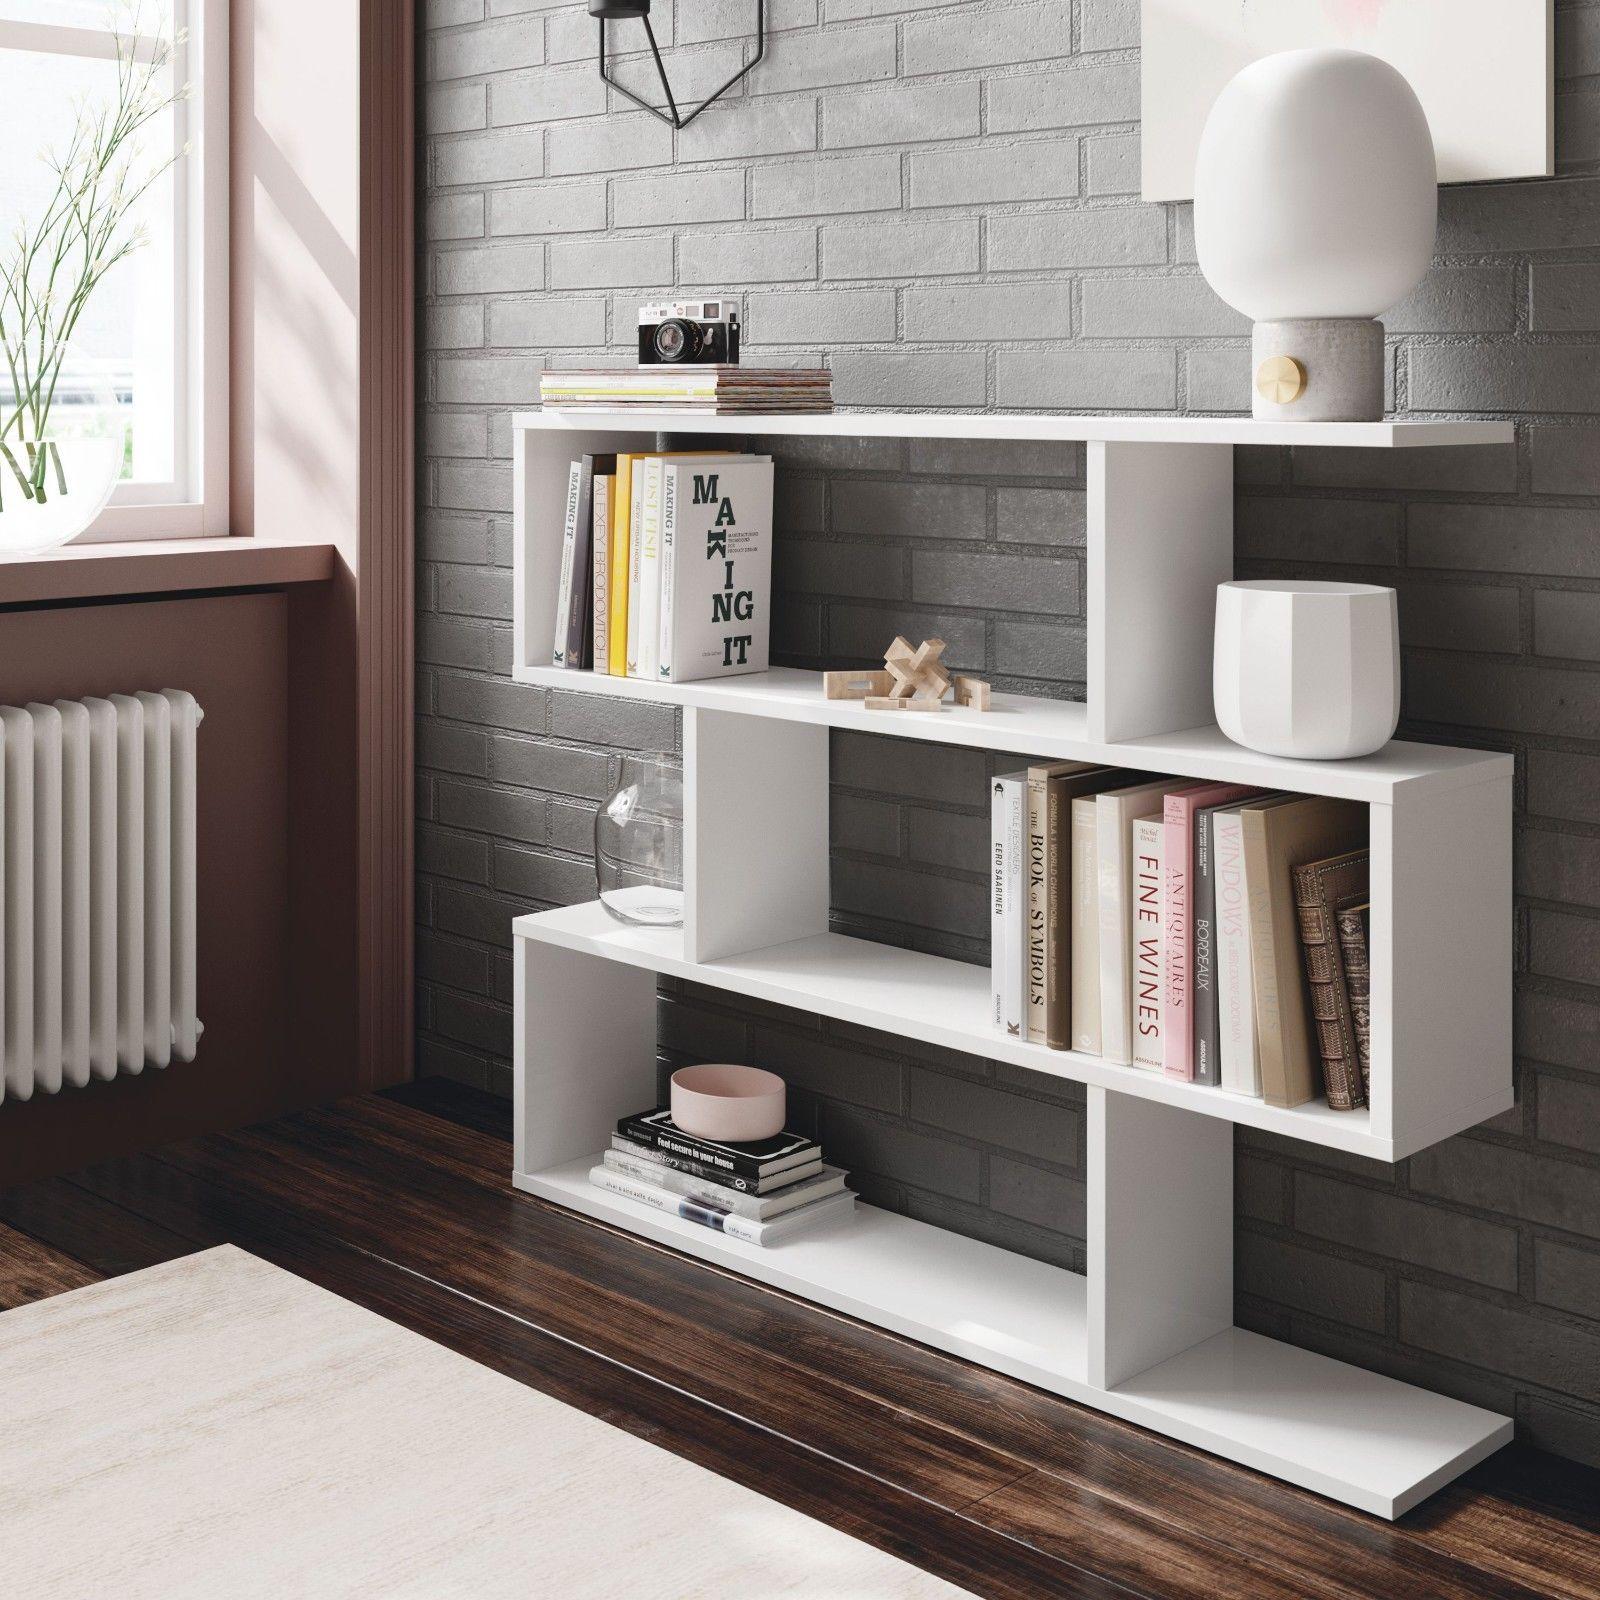 Estanteria baja libreria, mueble para comedor salon acabado Blanco ...